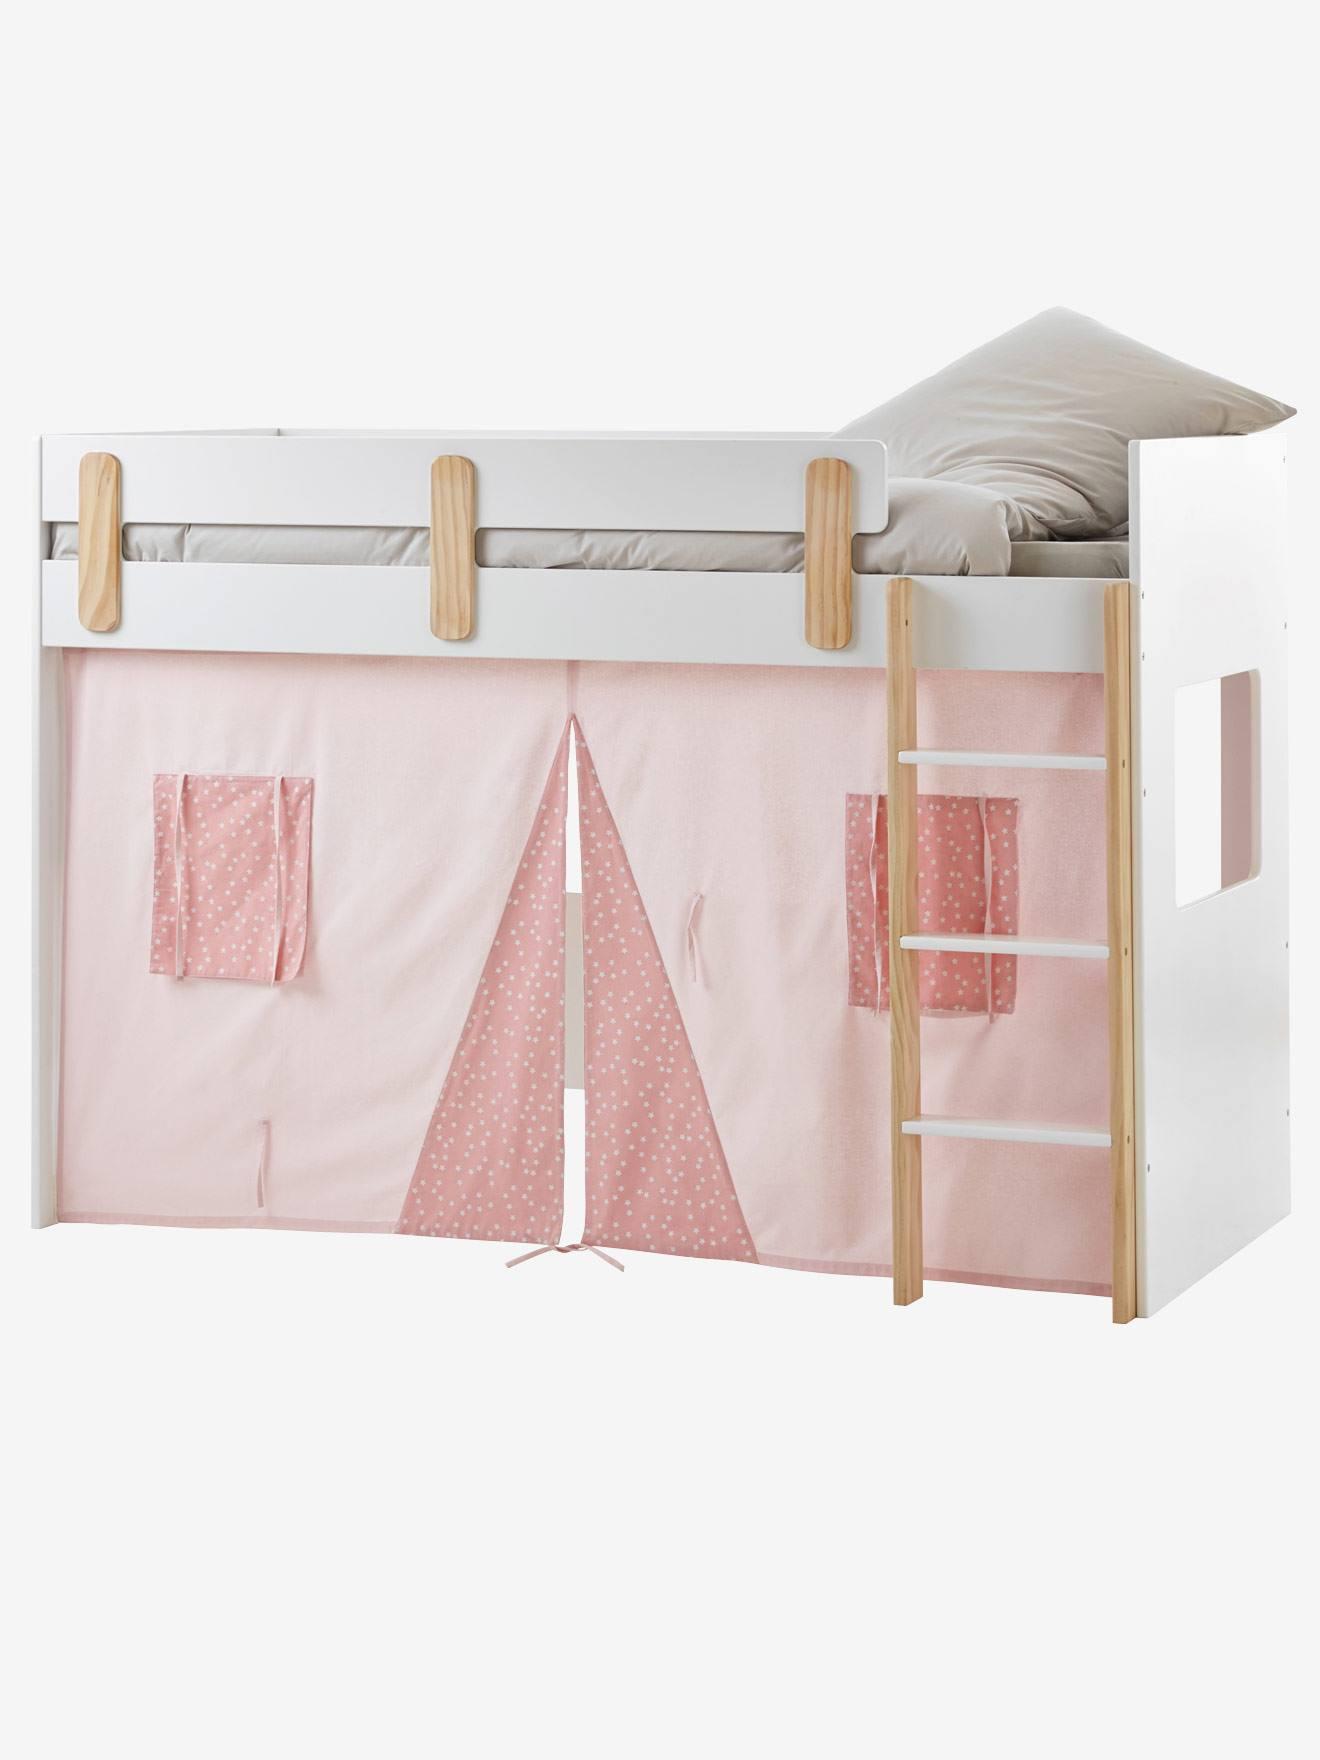 habillage lit cabane free tente de lit enfant pas cher with habillage lit cabane lit. Black Bedroom Furniture Sets. Home Design Ideas